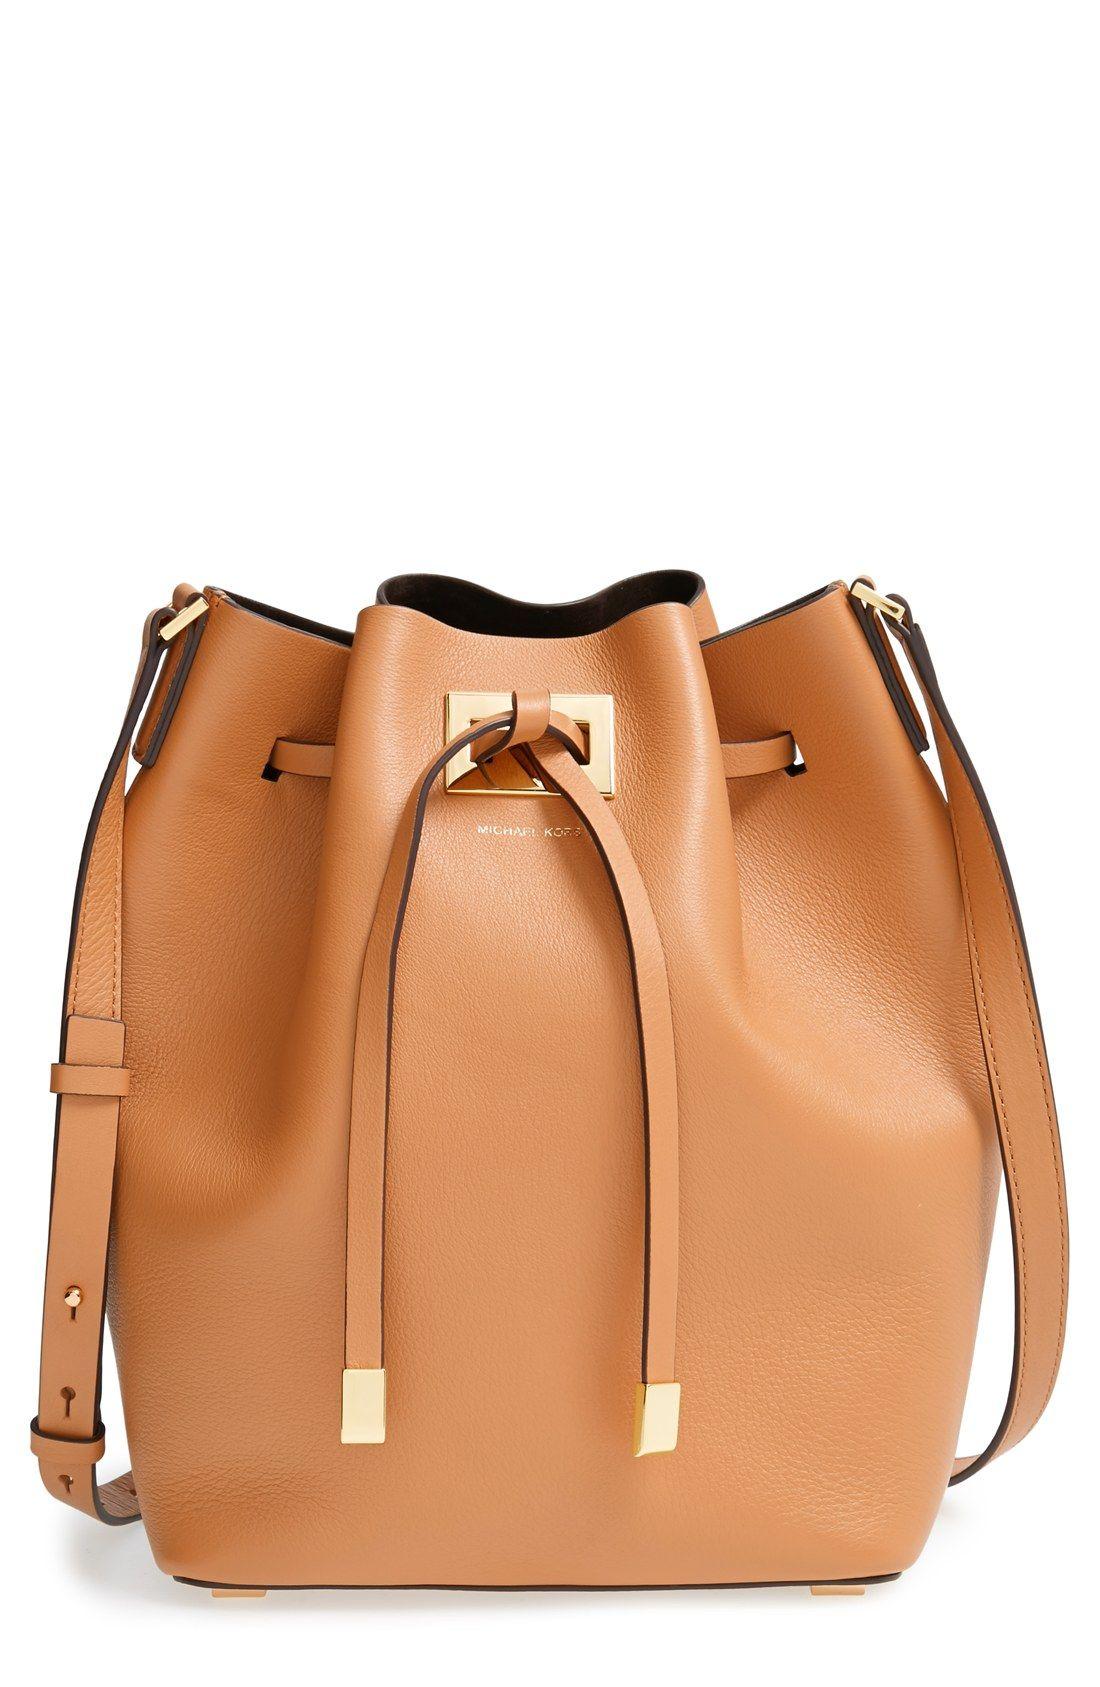 Bolsos Juveniles · Zapatos · Metalizados · Obsessing over this Michael Kors  leather bucket bag. Bolsas Mk df41c5113a844